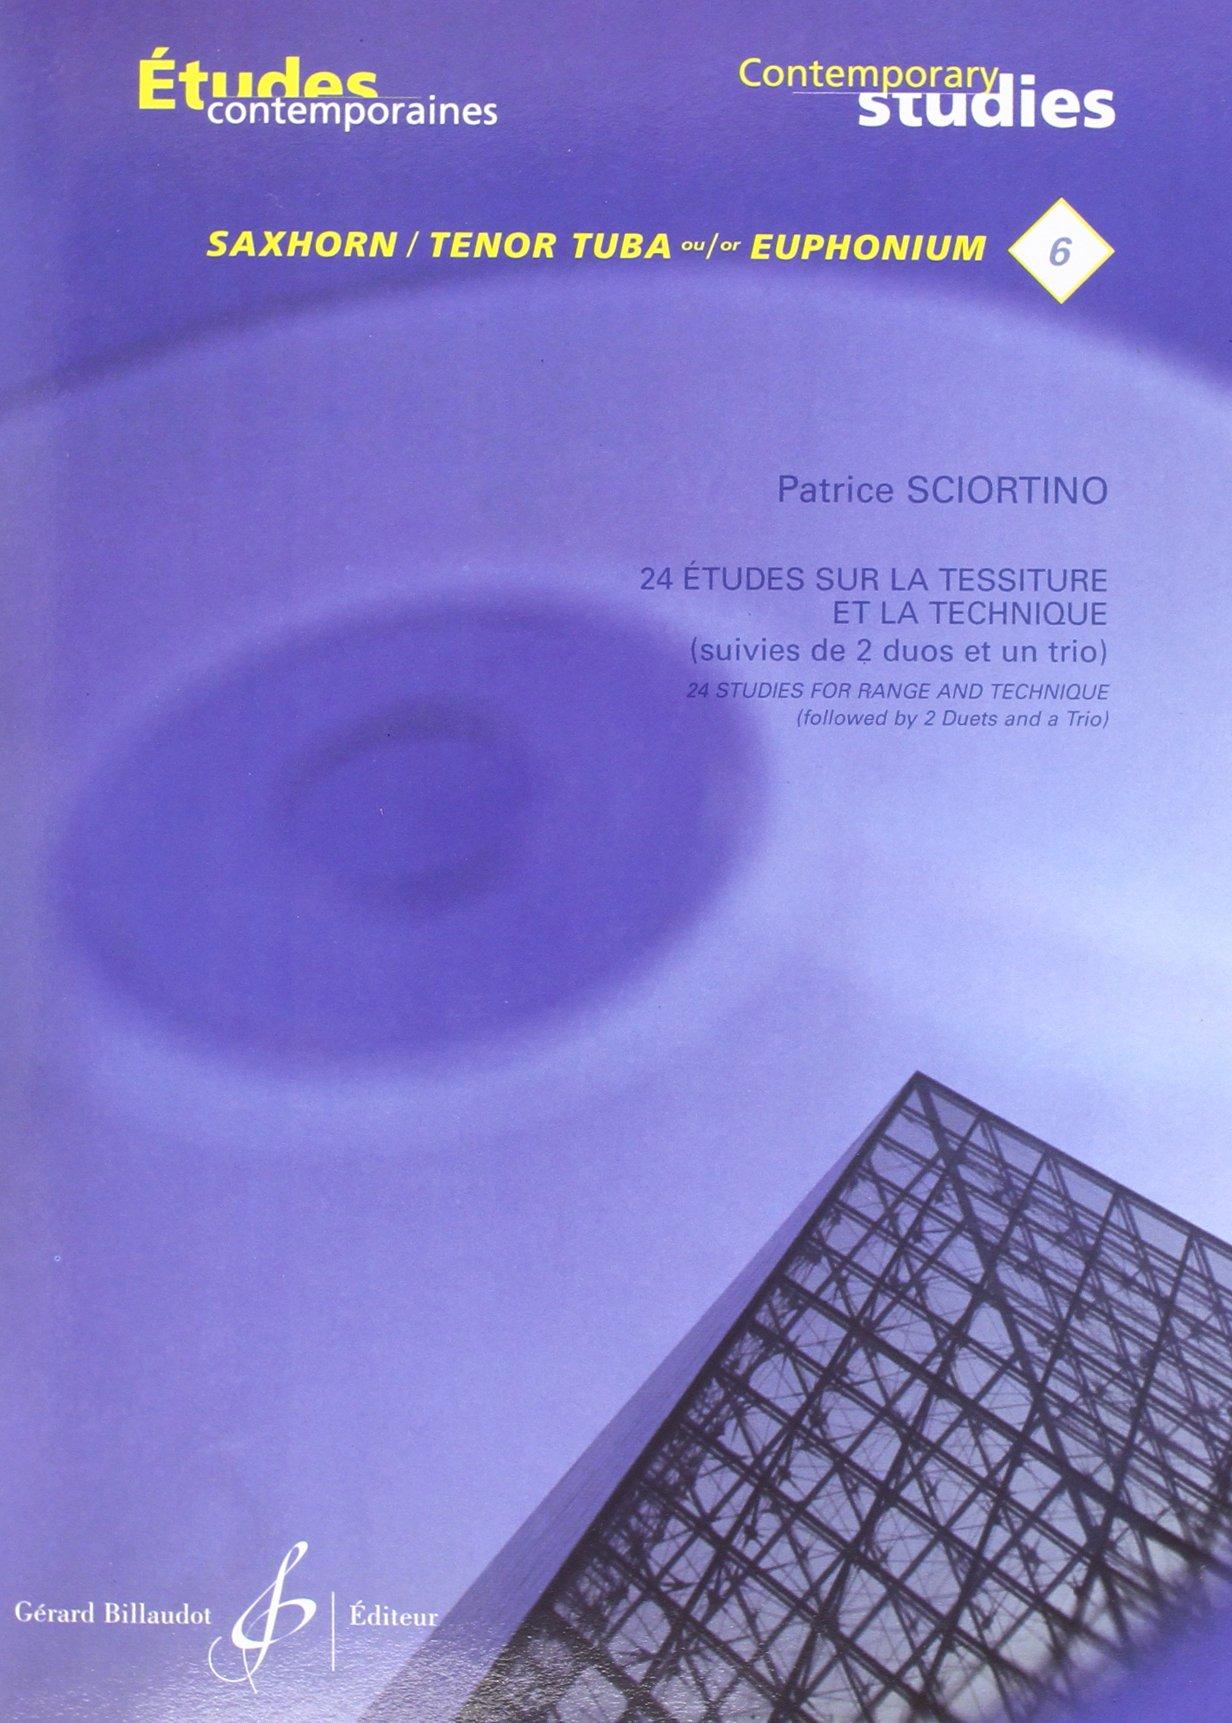 24 Etudes : Tessiture et Technique Taschenbuch – 30. April 2010 Sciortino Patrice Billaudot B003JYOV6I